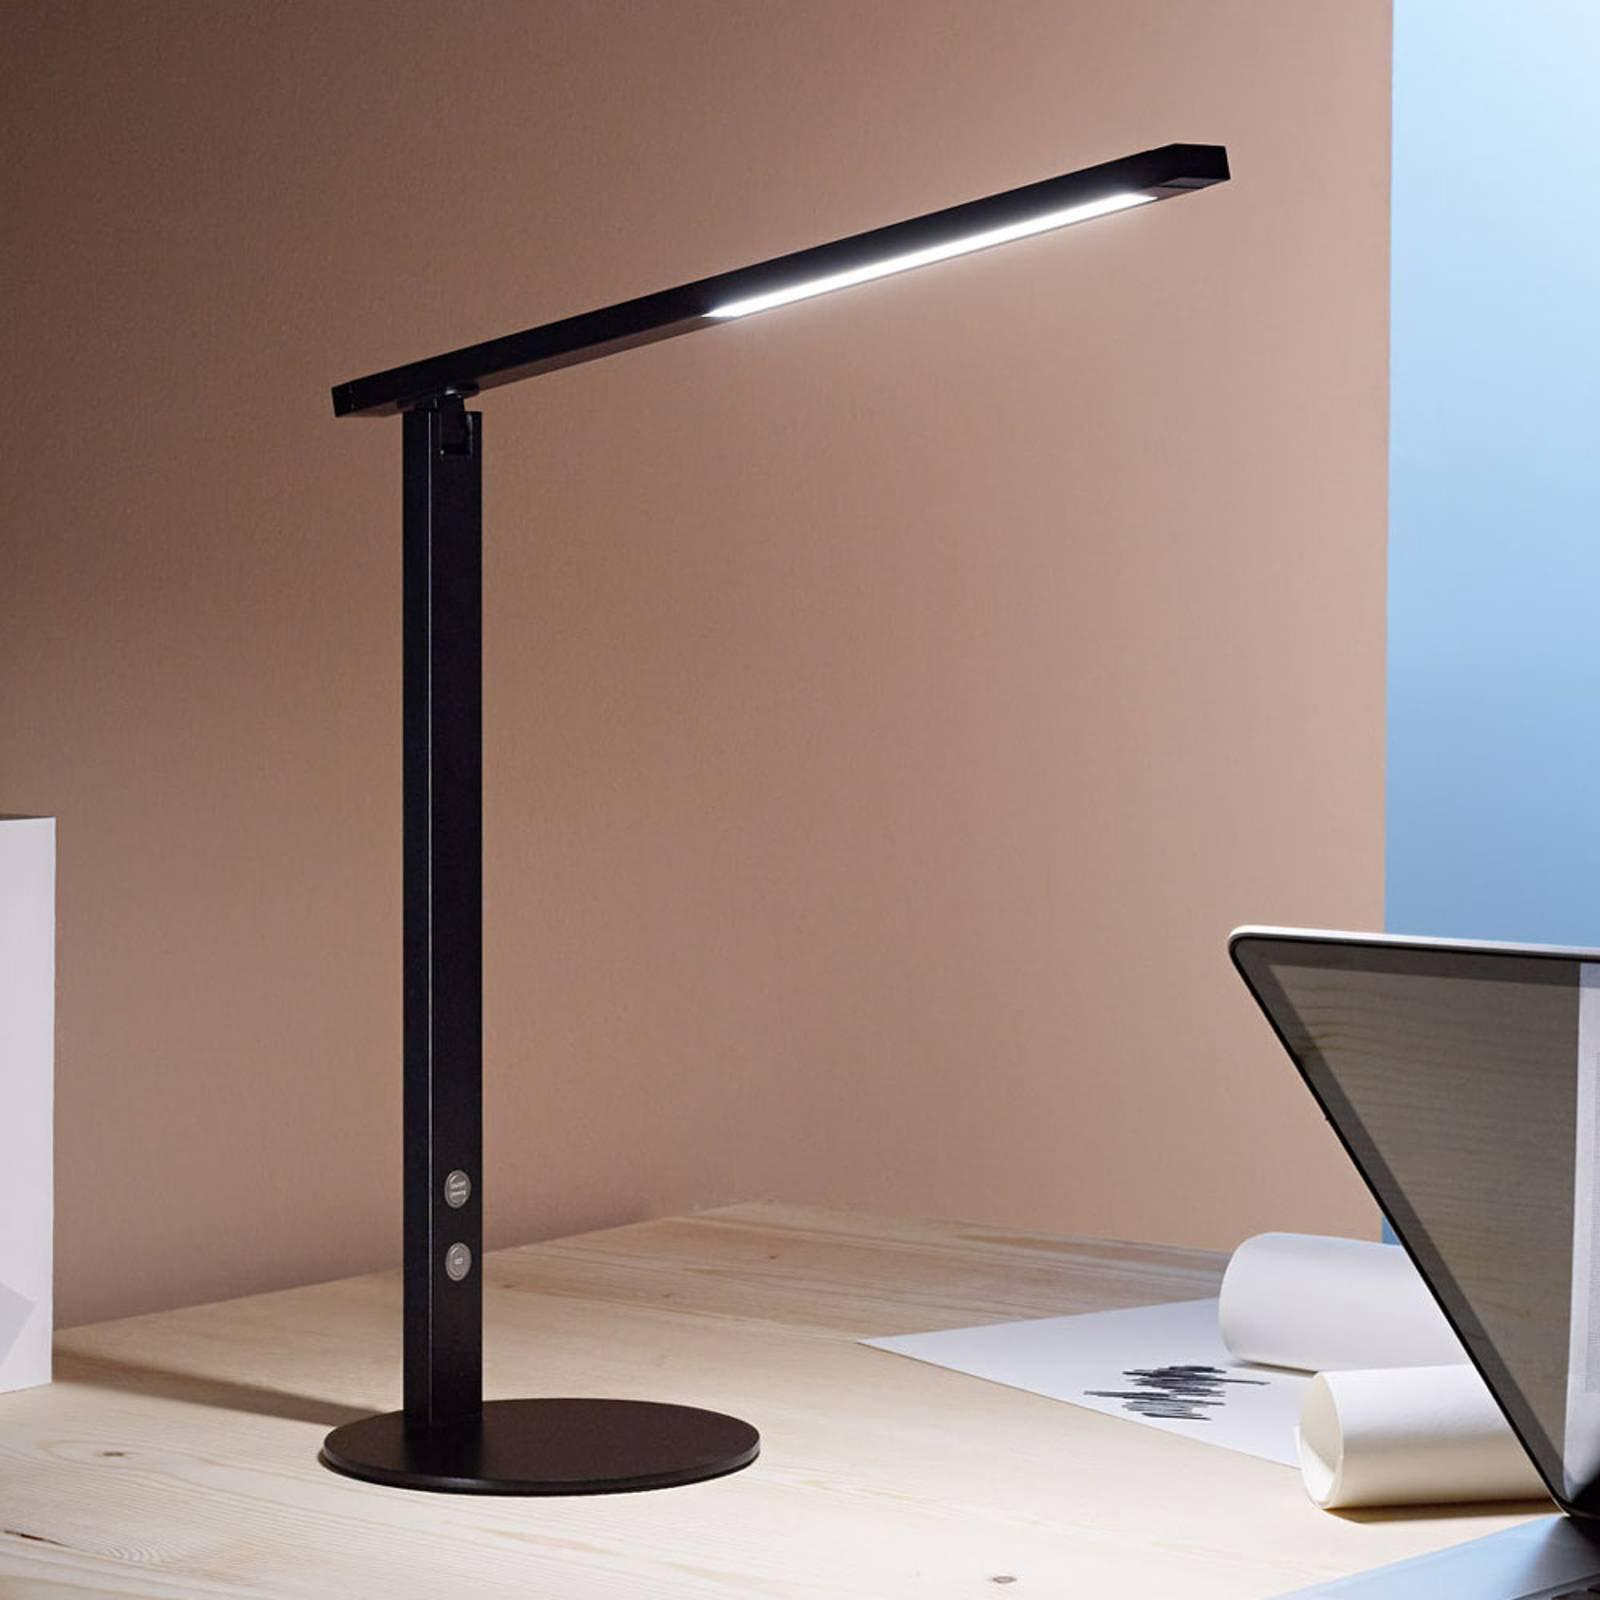 LED-skrivebordslampe Ideal med dimmer, svart